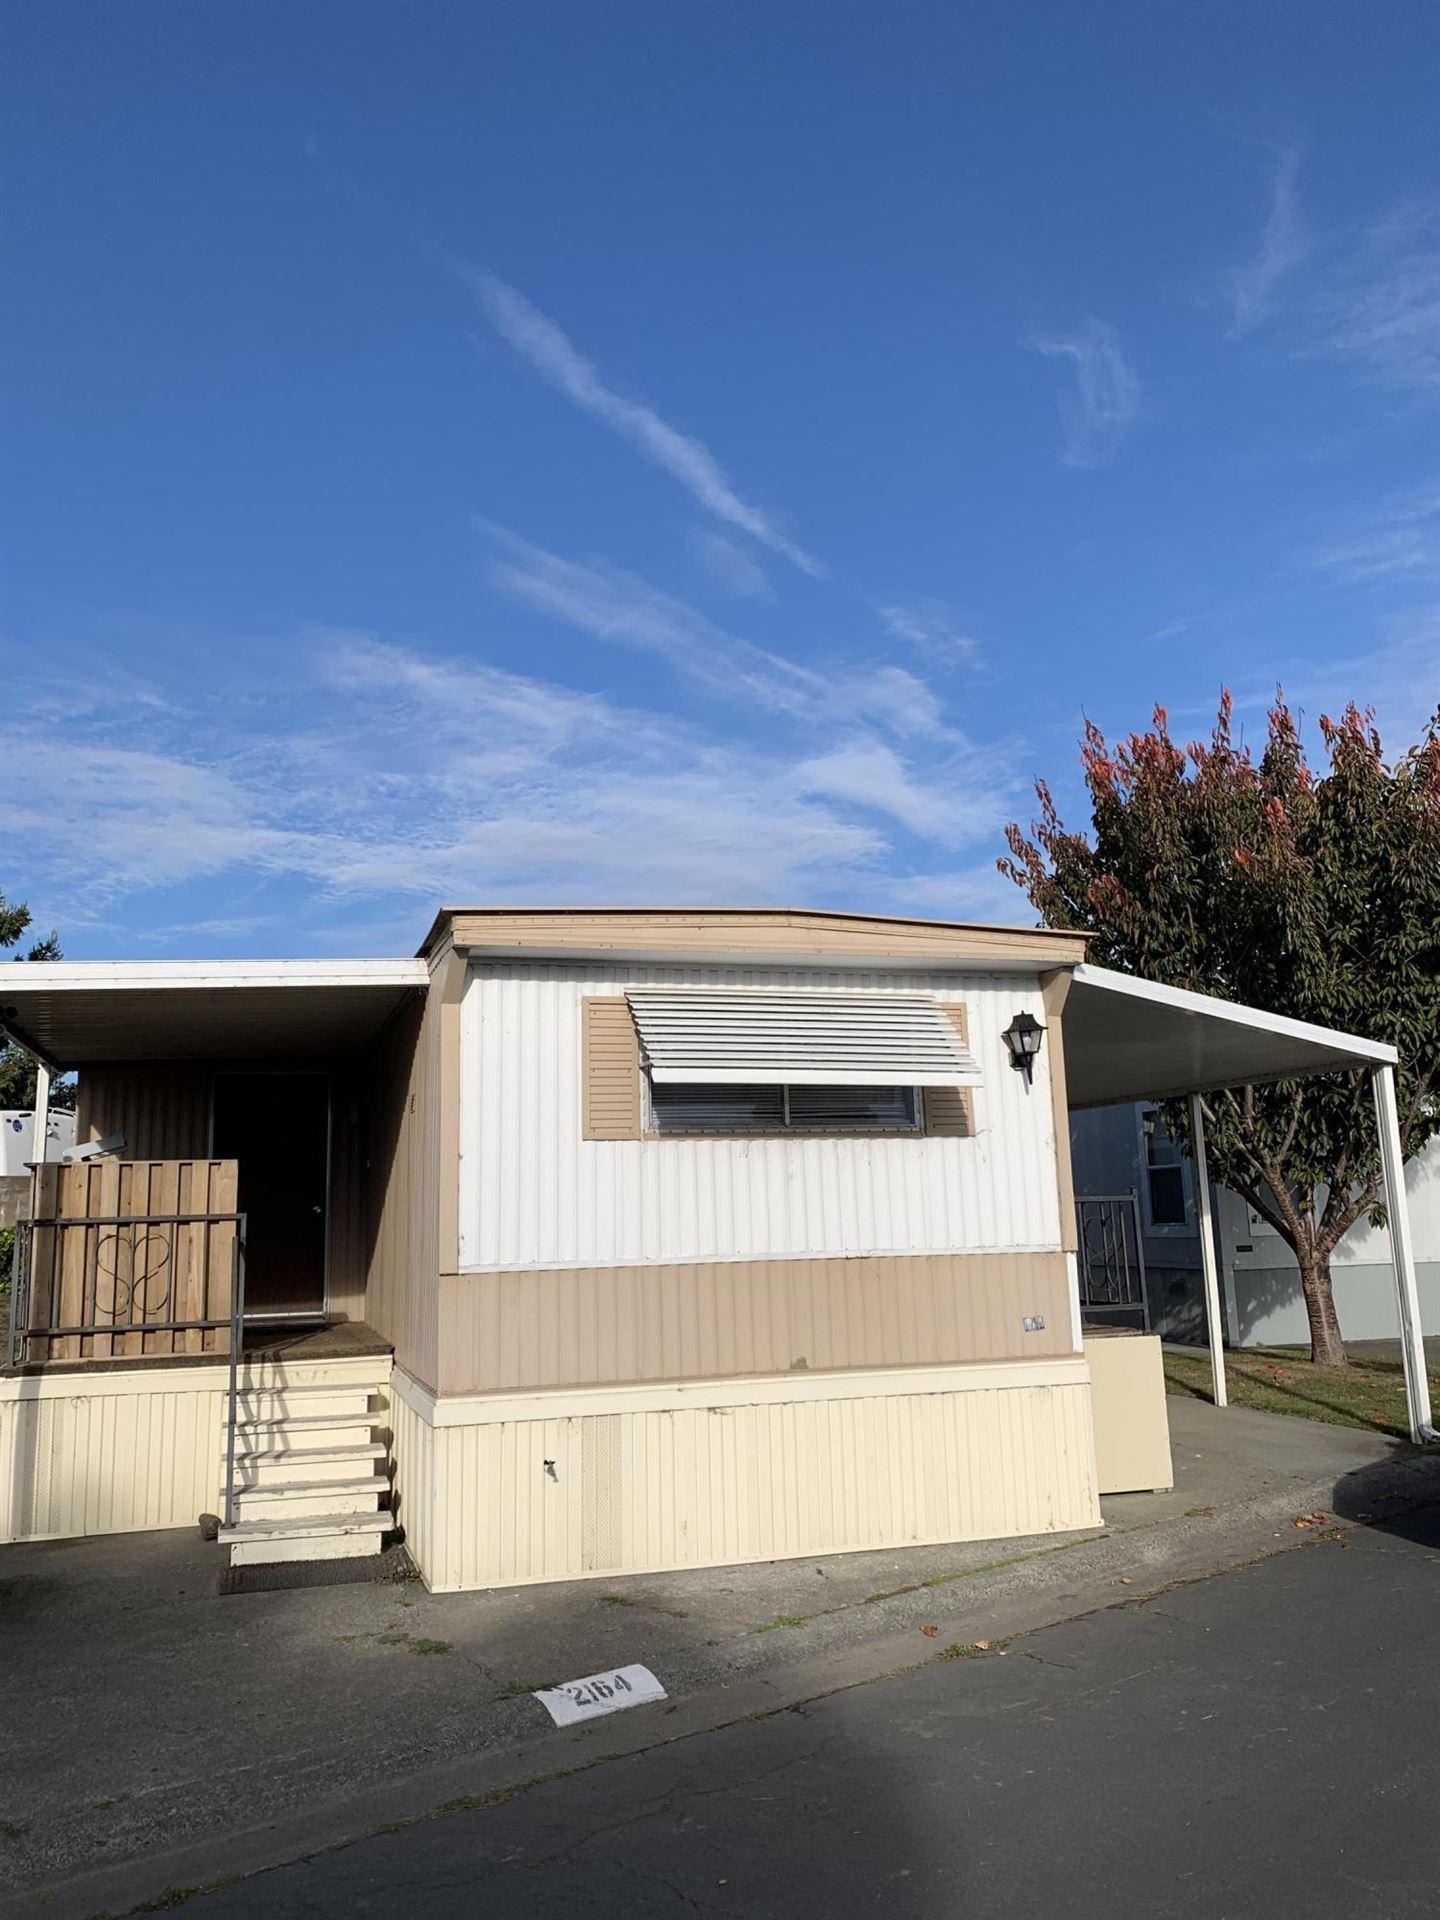 2164 Palomino Lane, Arcata, CA 95521 - MLS#: 257793